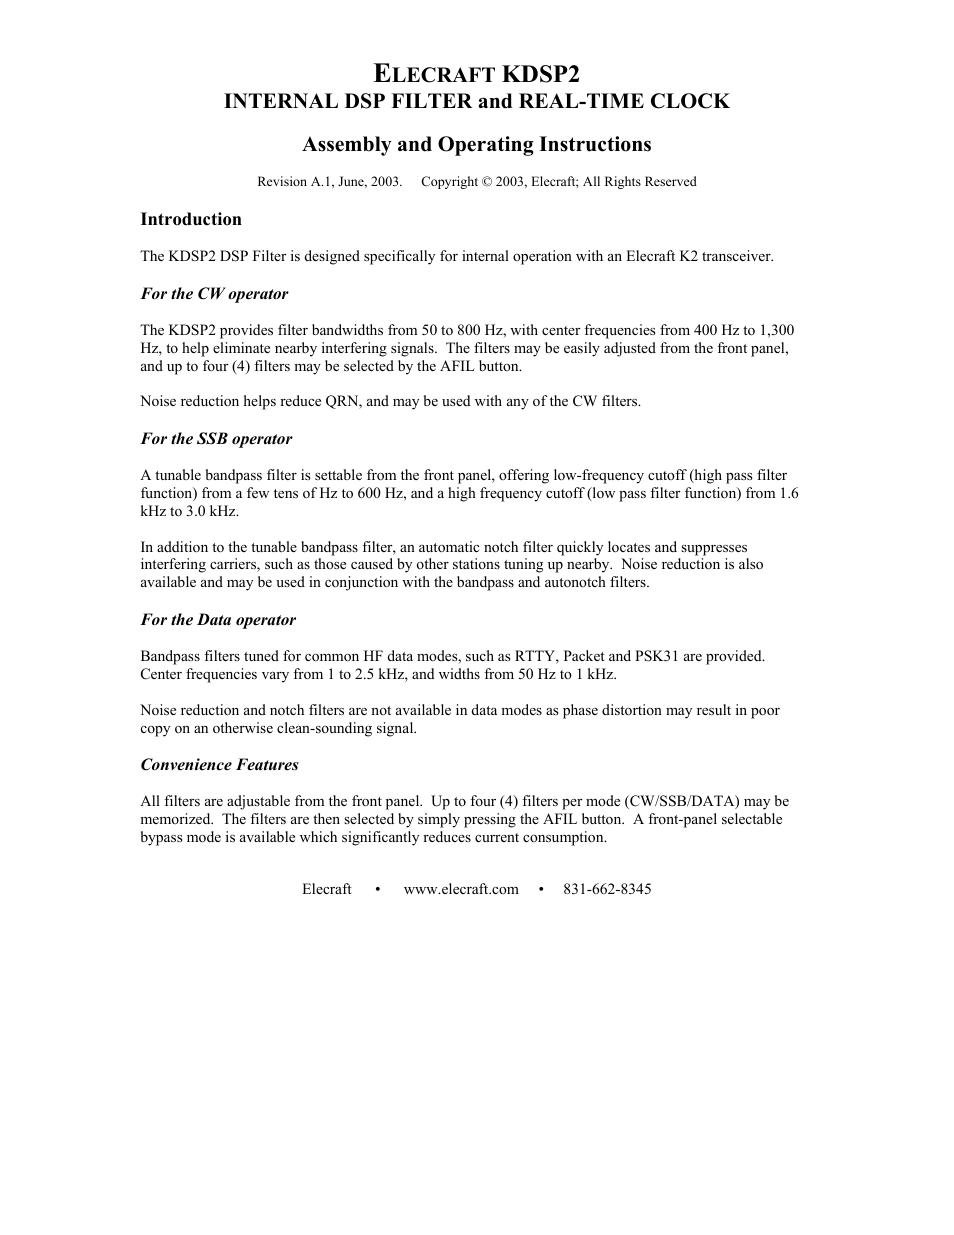 Elecraft KDSP2 Manual User Manual | 50 pages